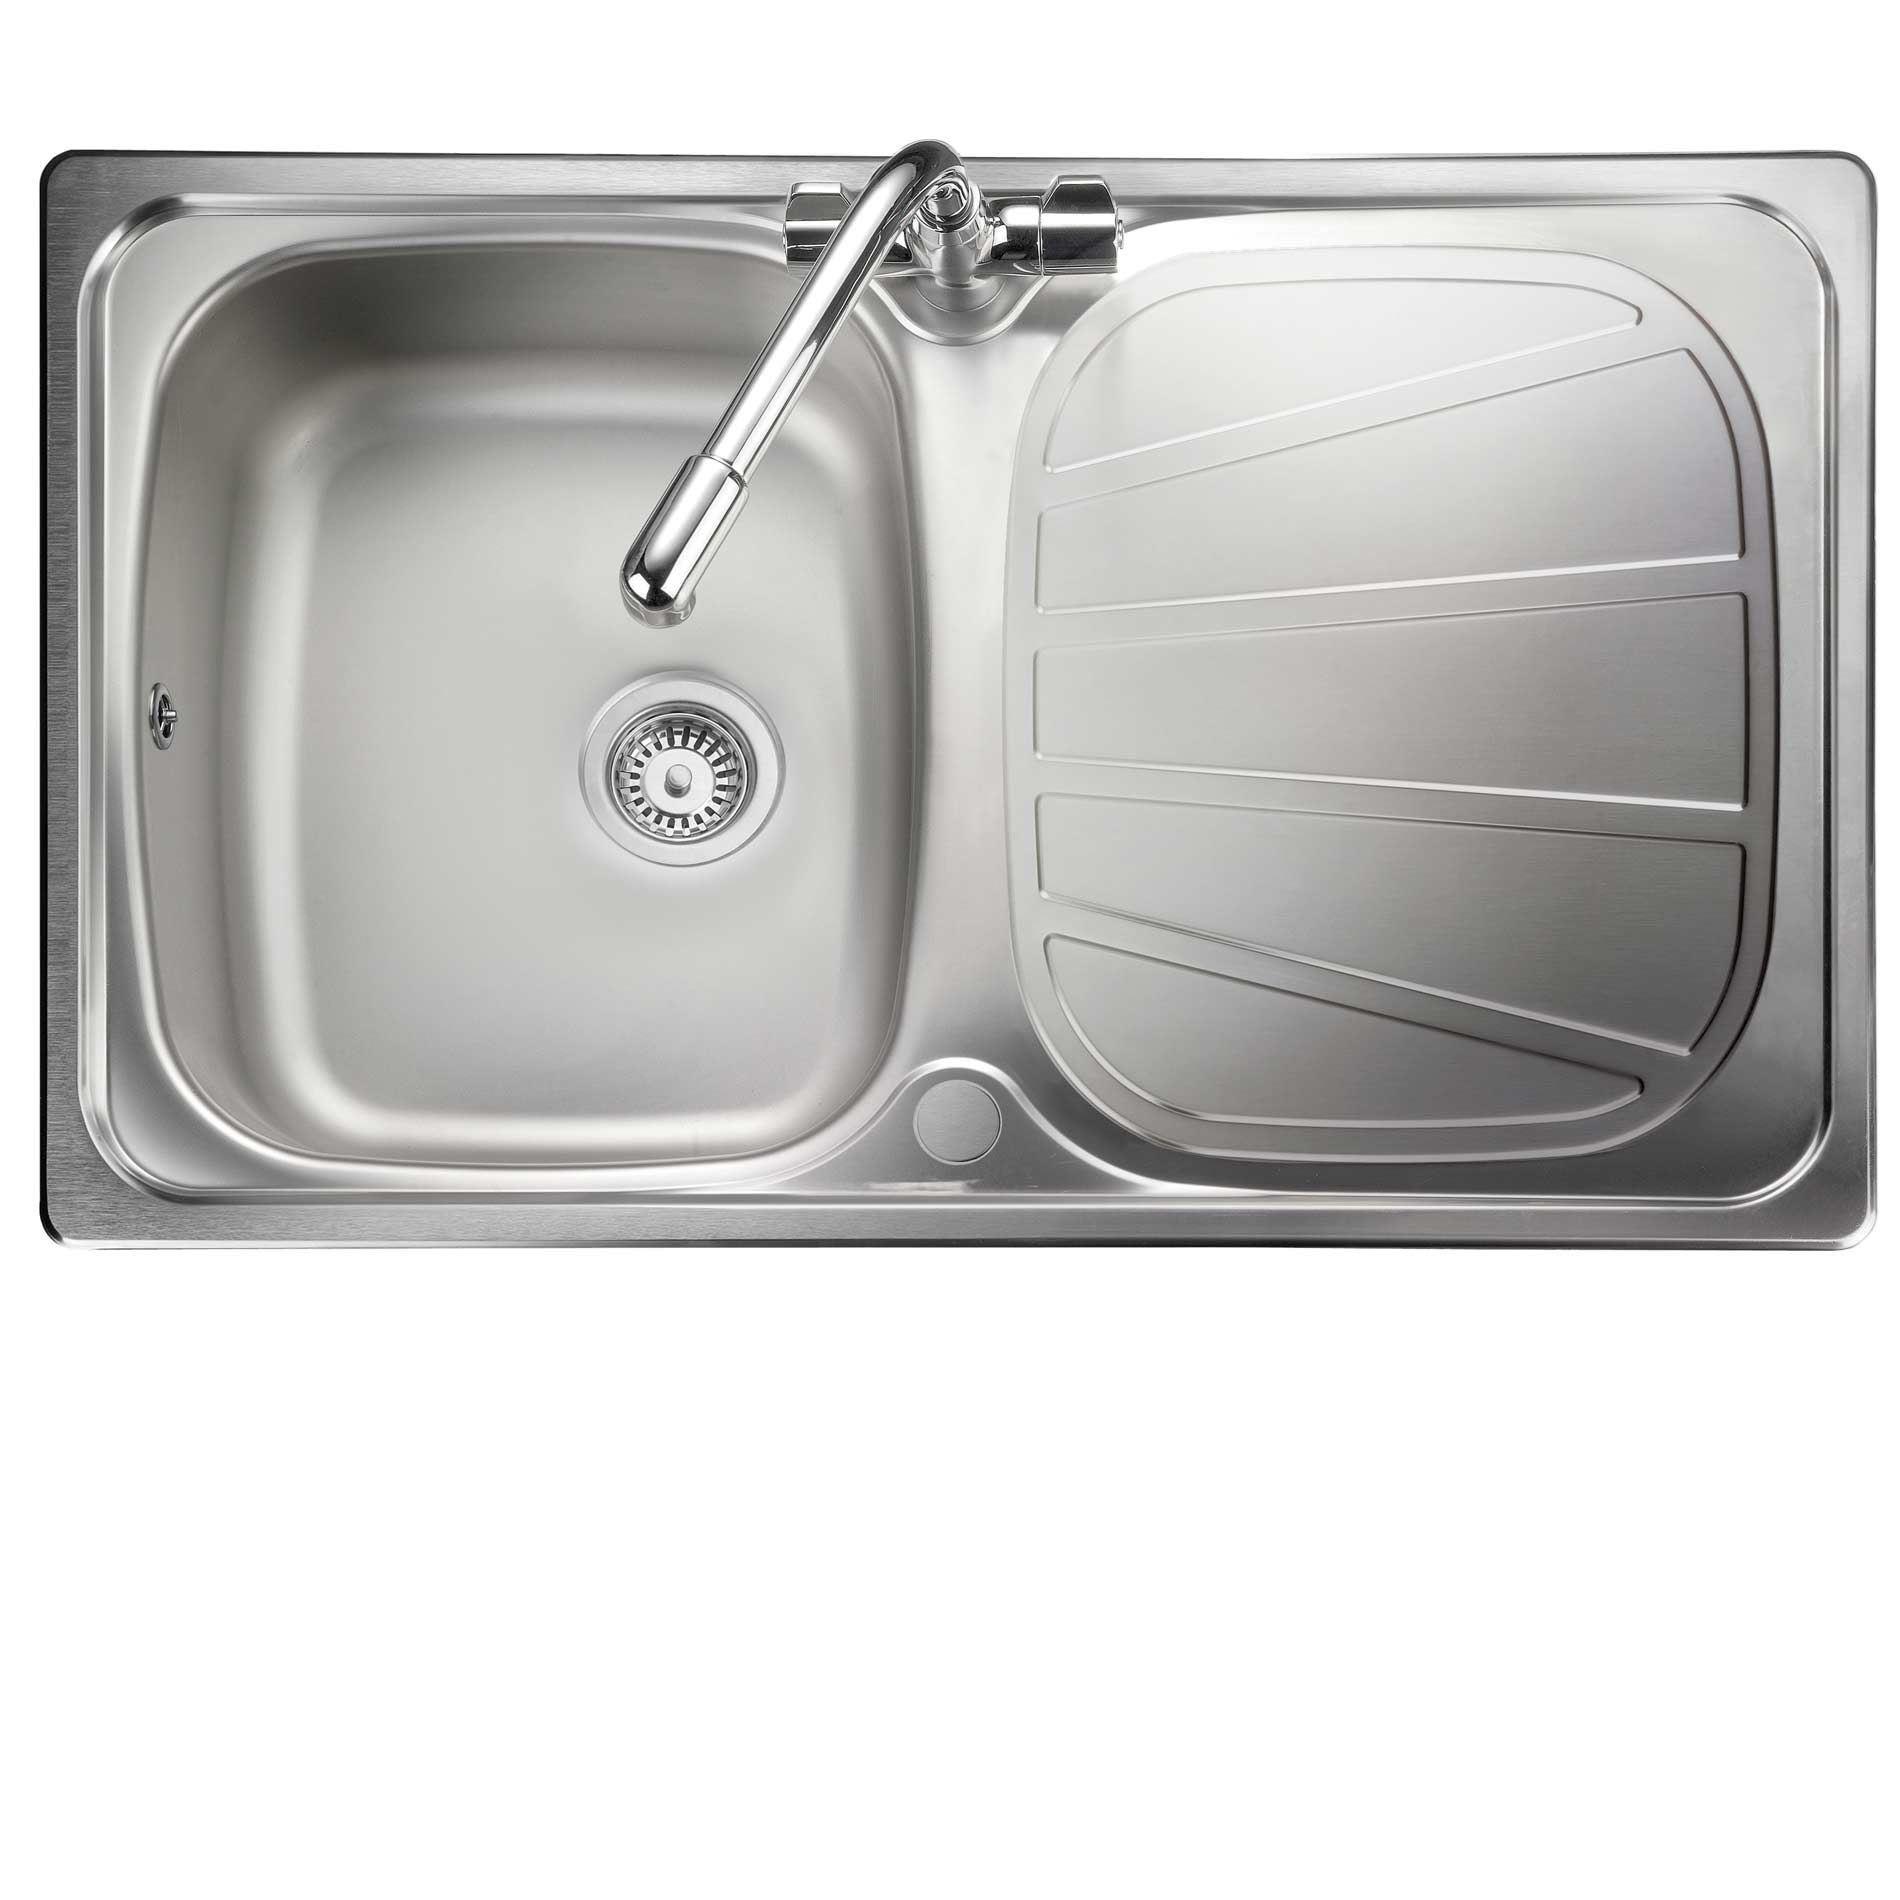 rangemaster: baltimore compact bl8001 stainless steel sink